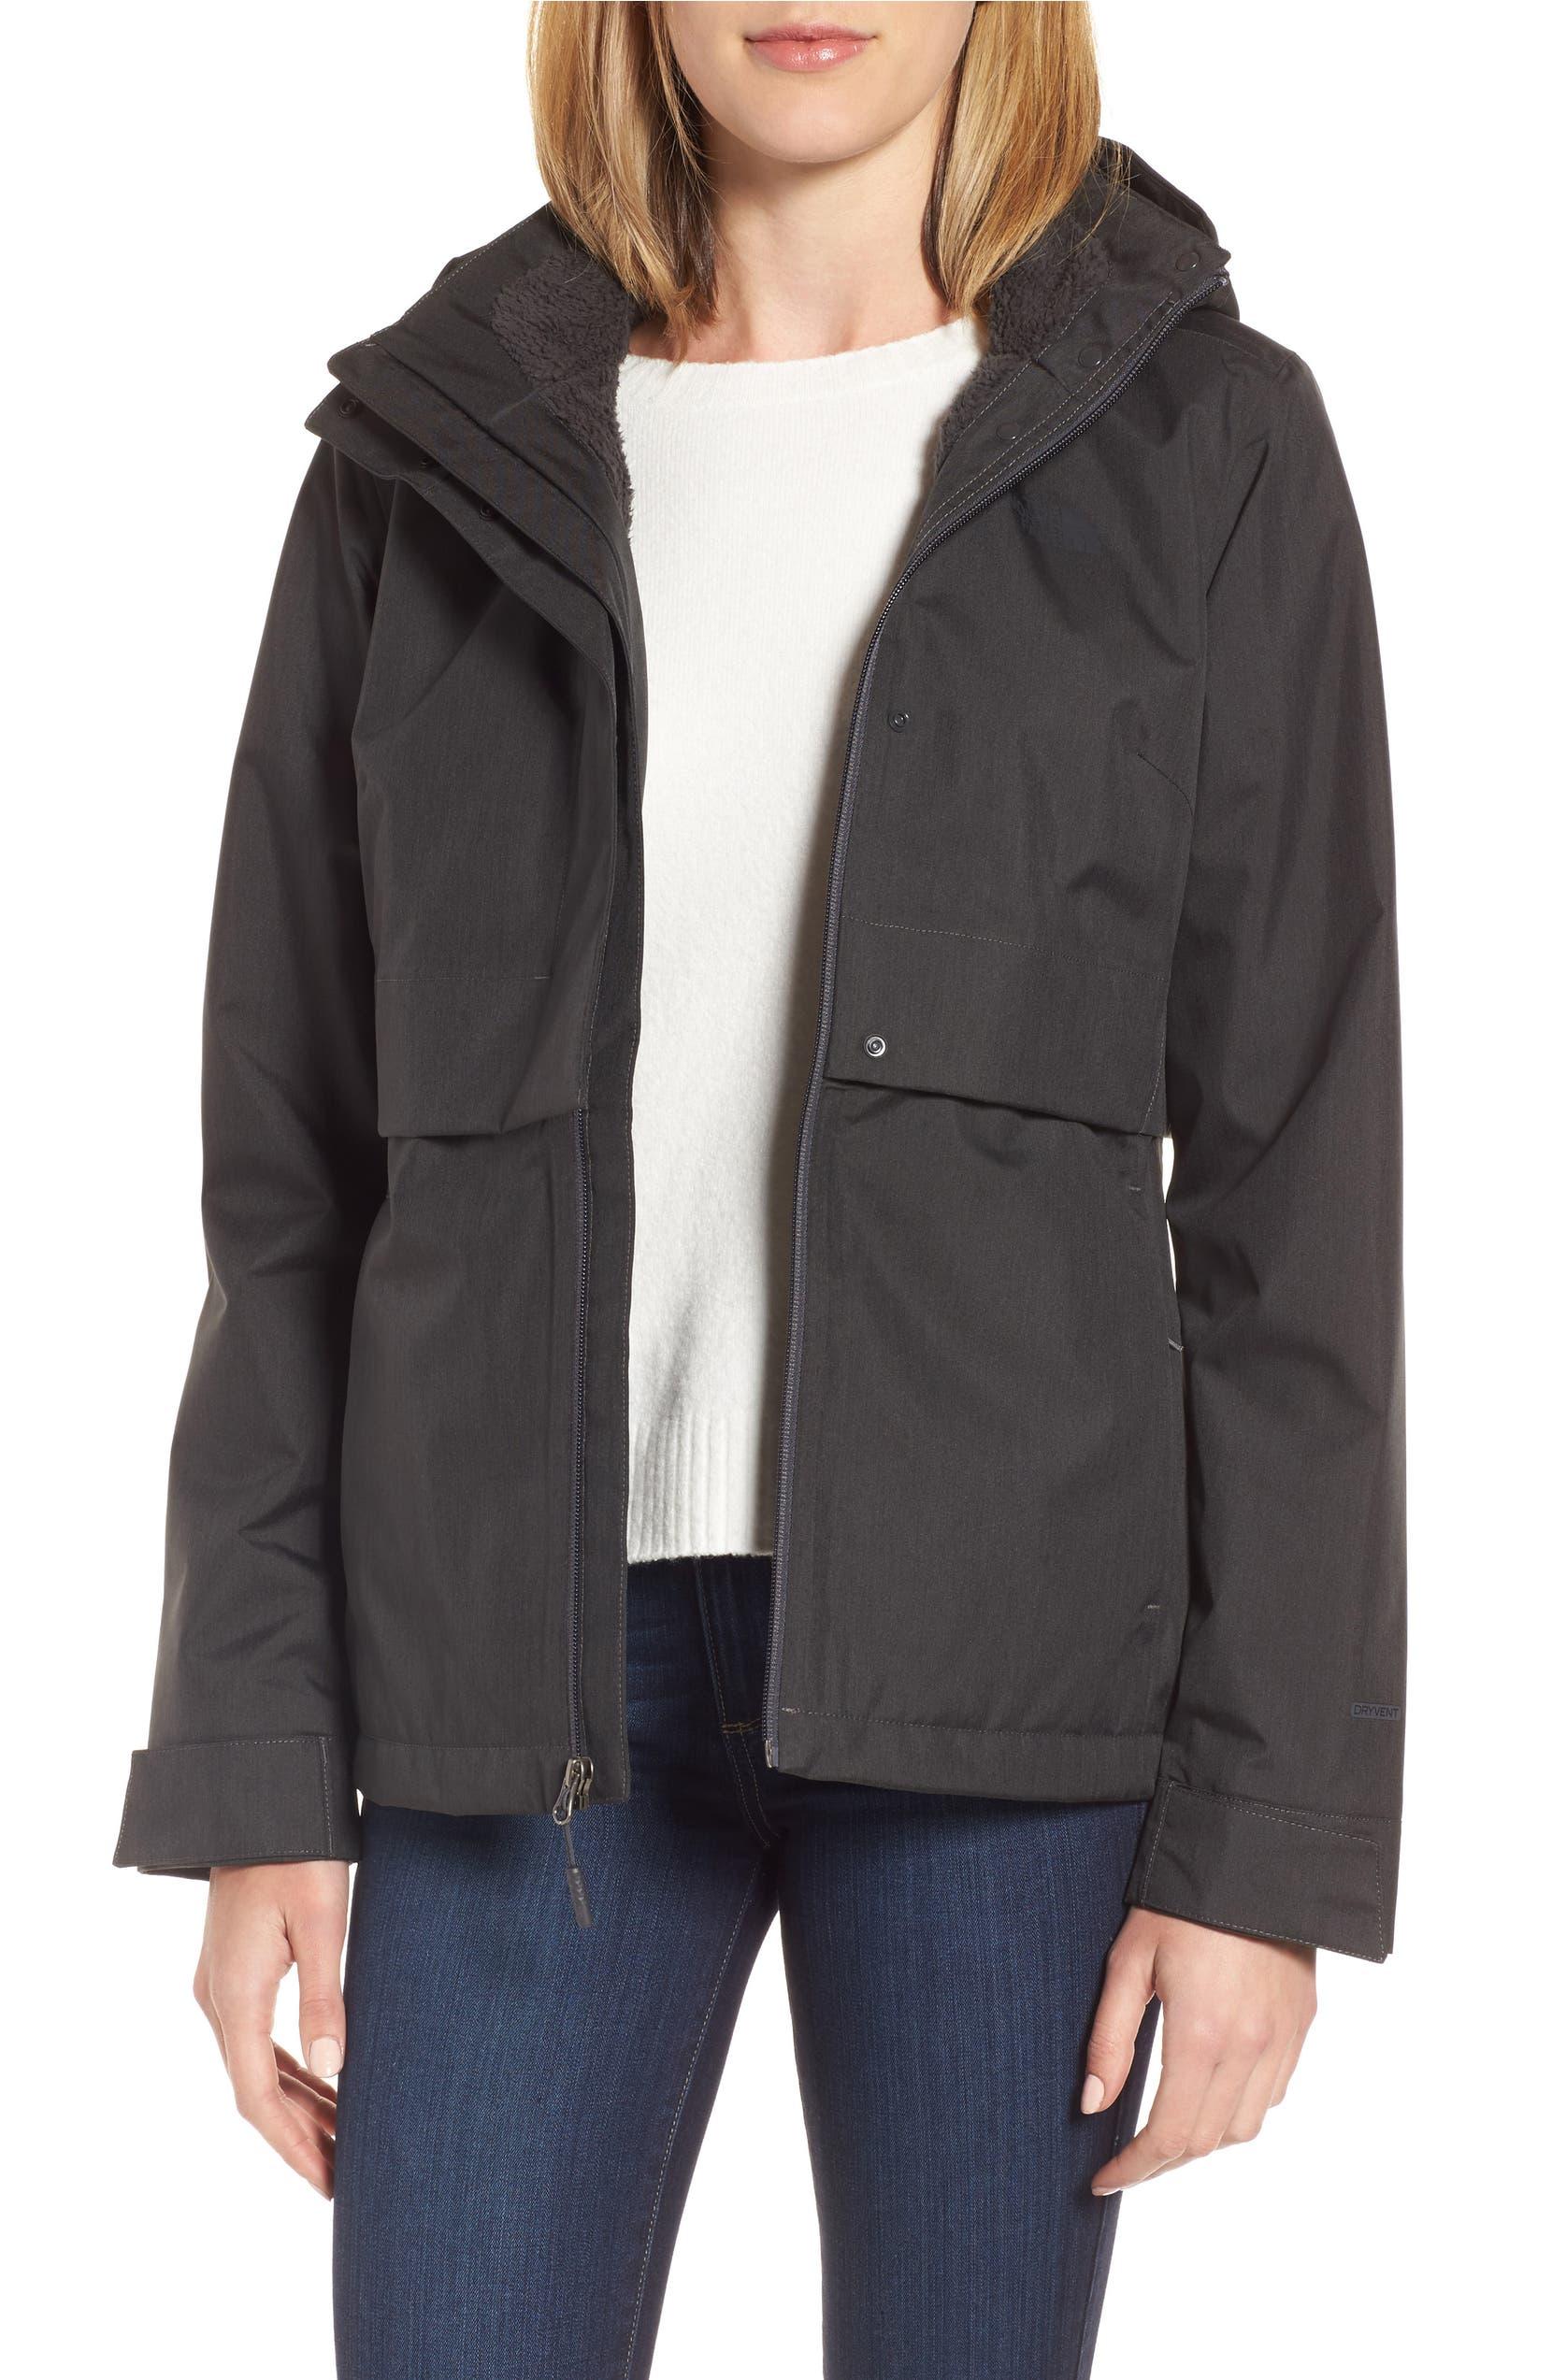 67c35554f15b The North Face Morialta Jacket